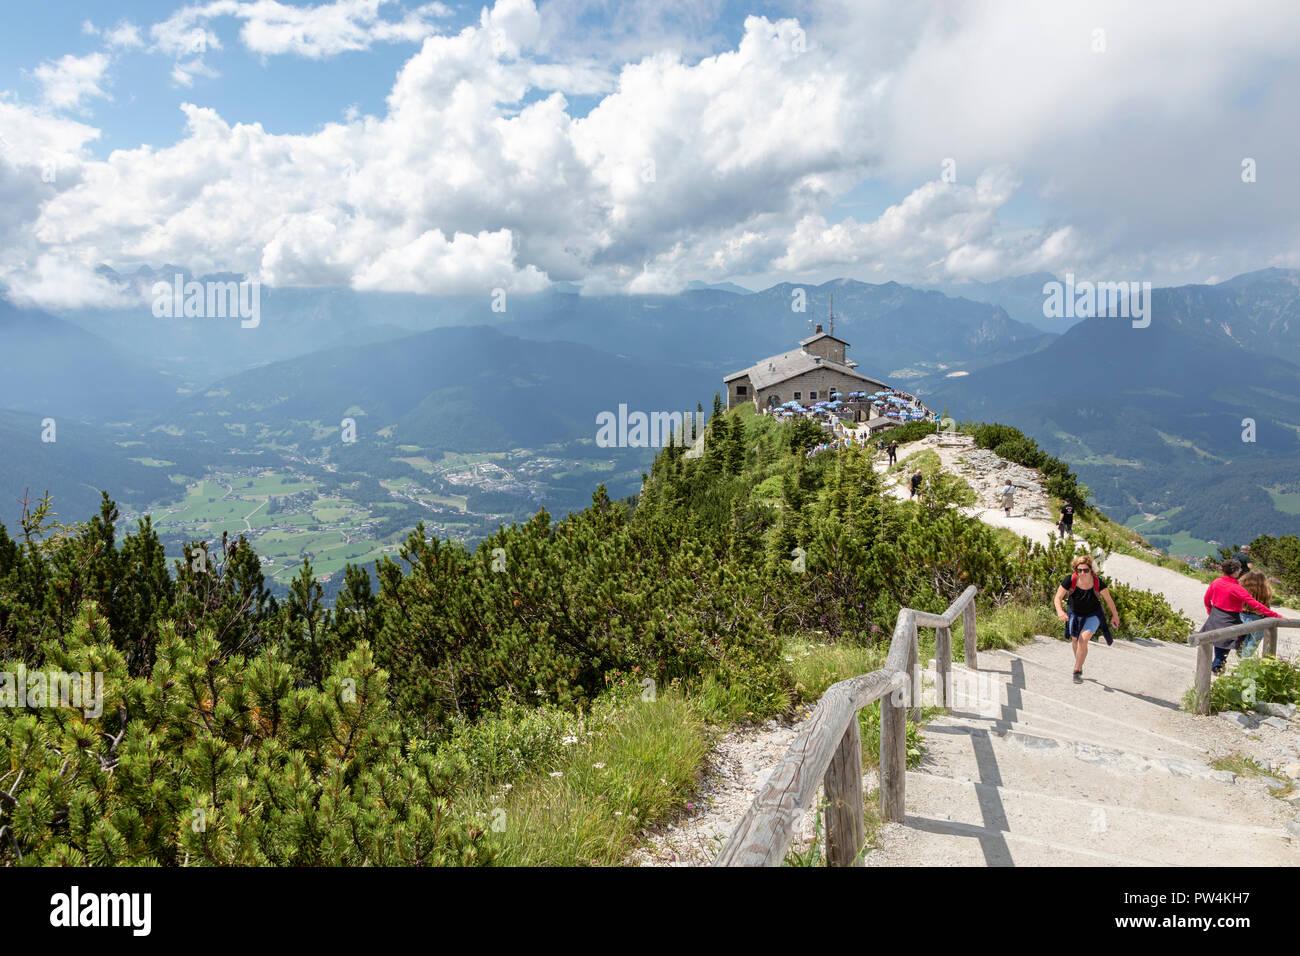 The Eagle's Nest, Berchtesgaden, Bavaria, Germany - Stock Image